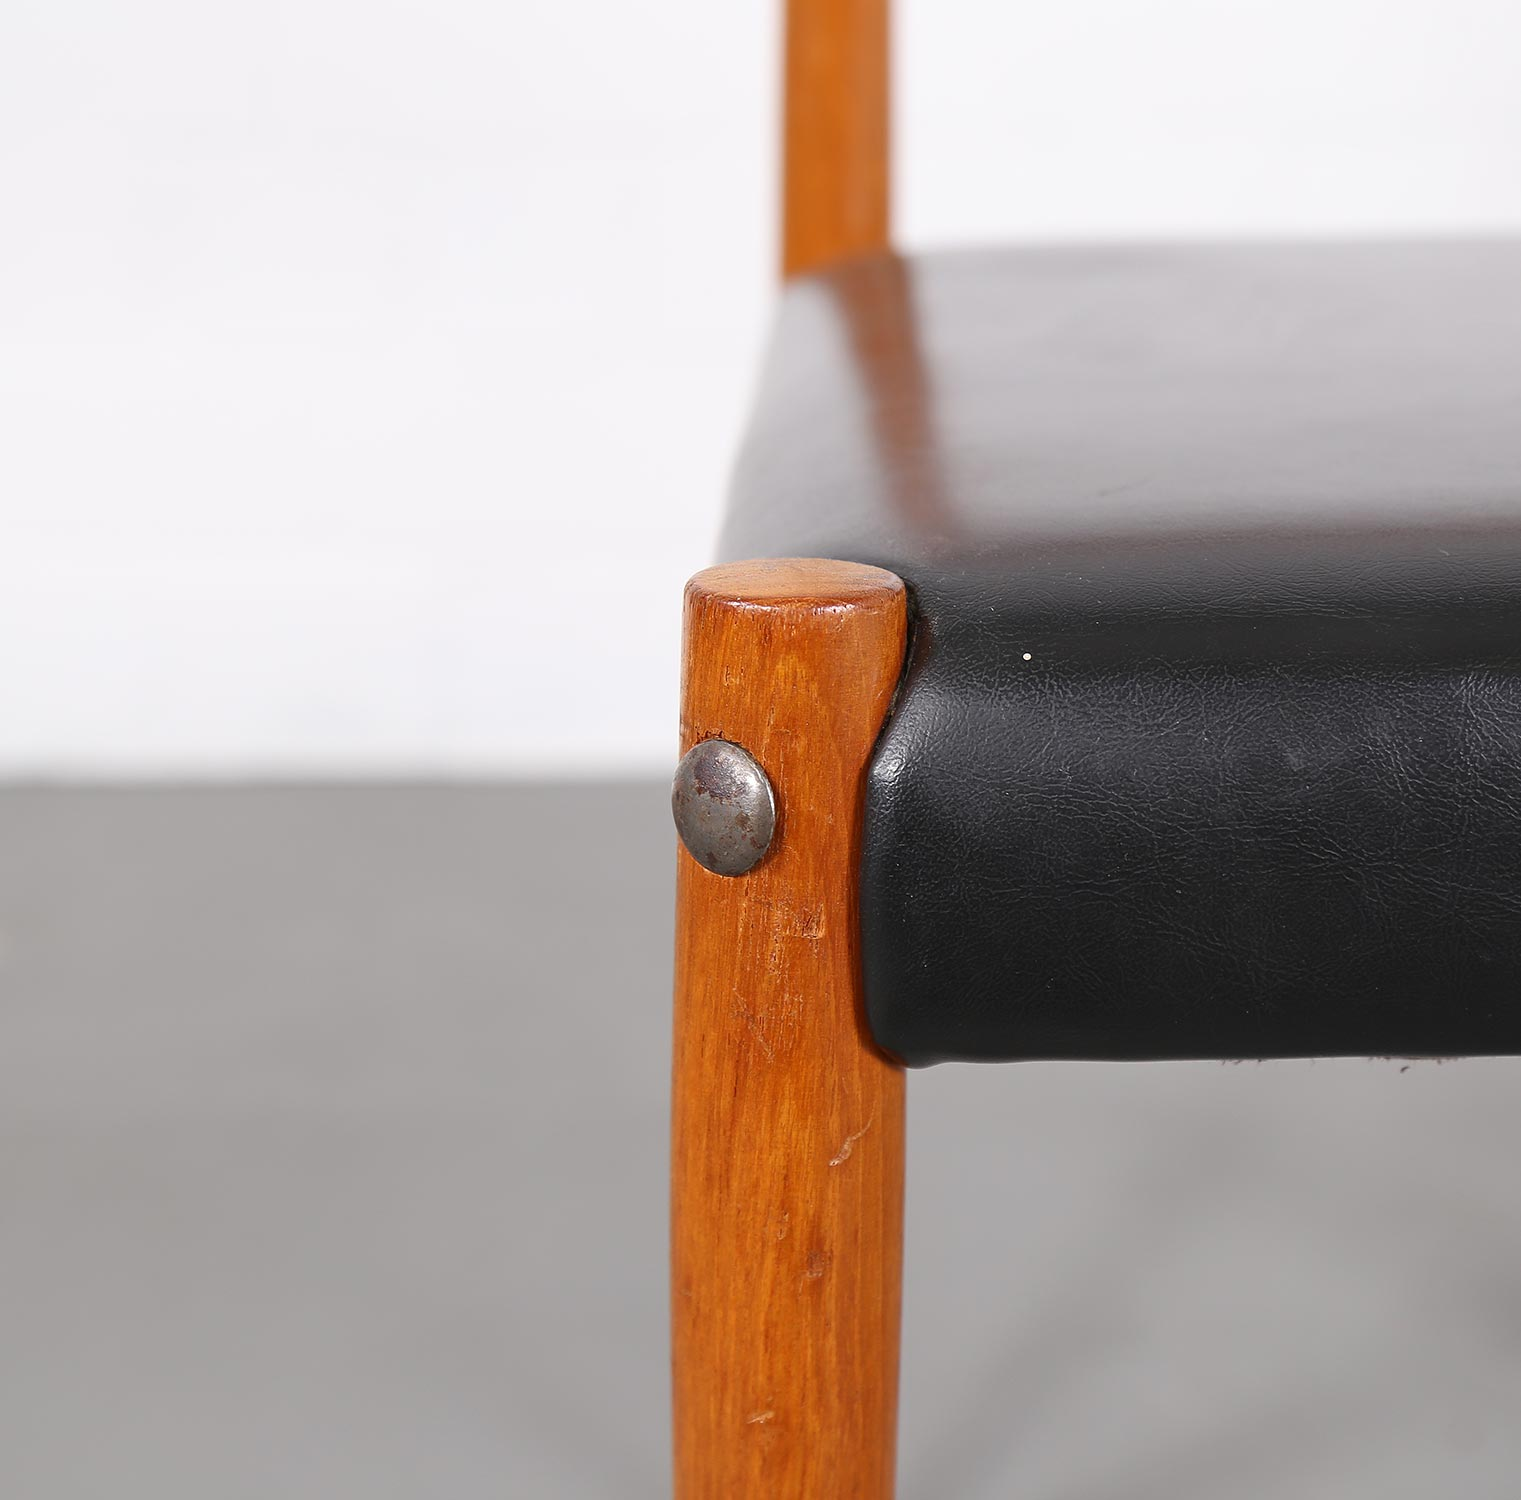 Danish design teak chair 60s luebke gebraucht used classic design furniture 07 dekaden Design sofa gebraucht